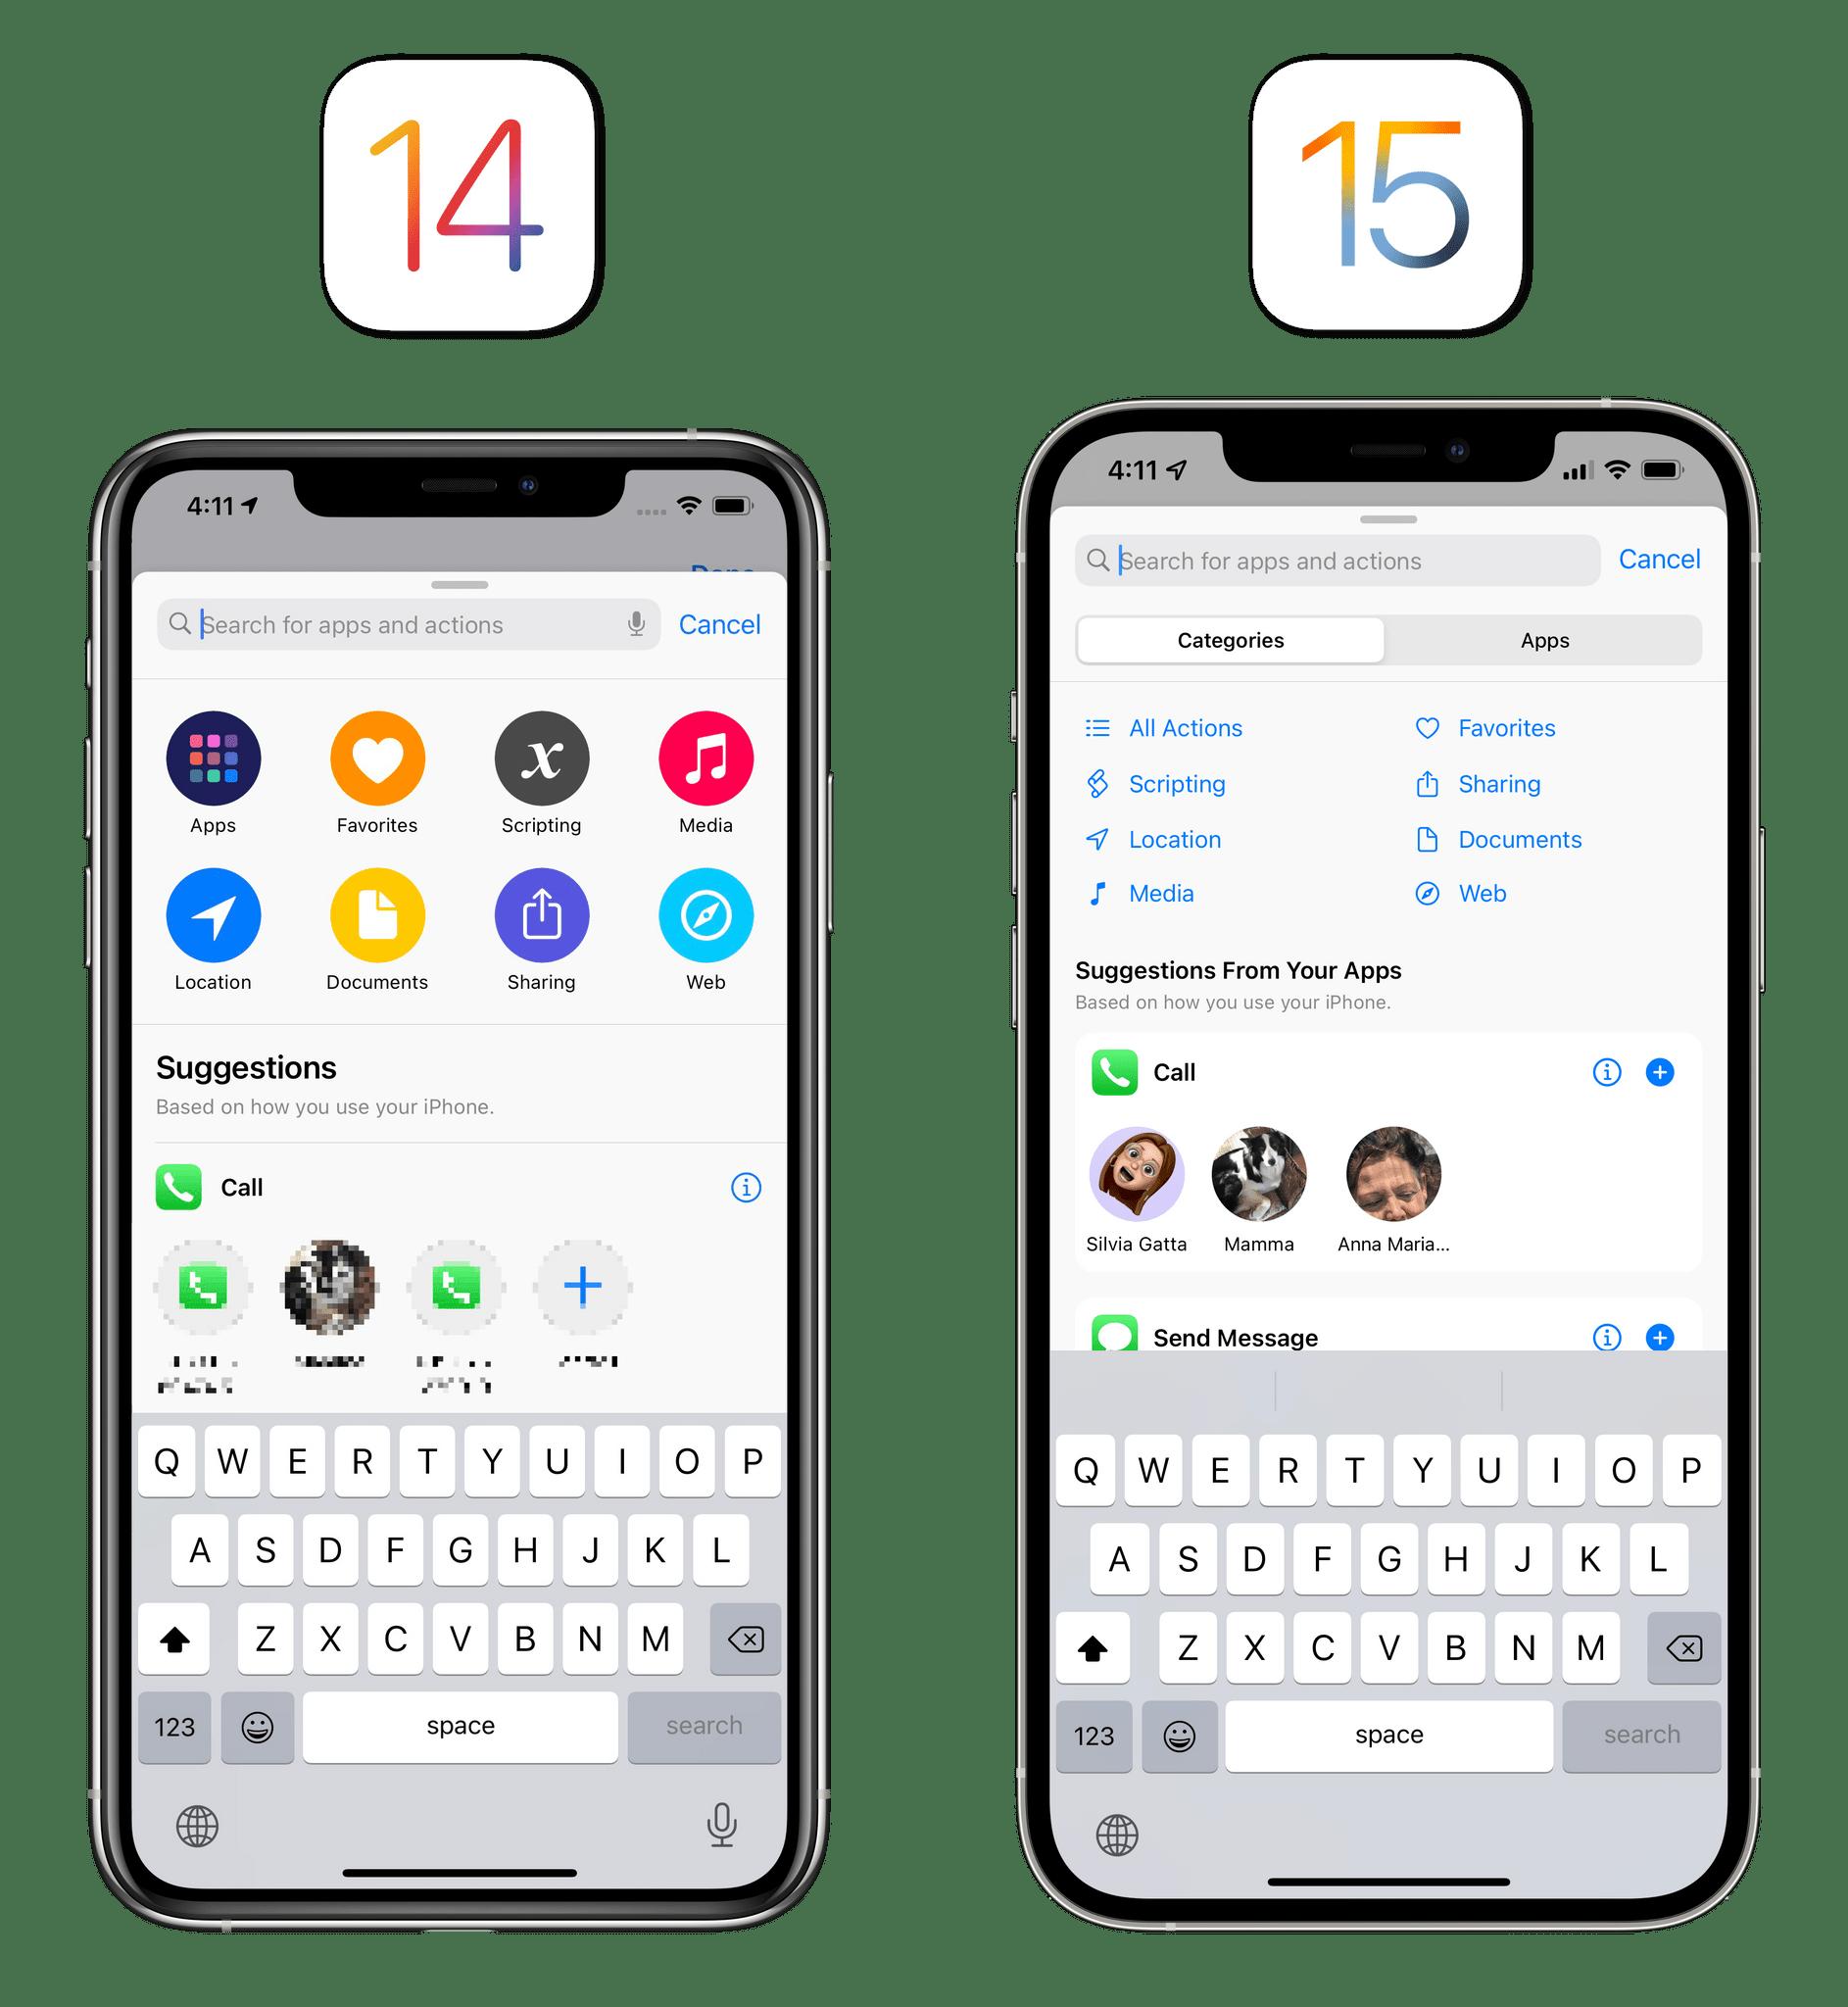 Why so boring, iOS 15?